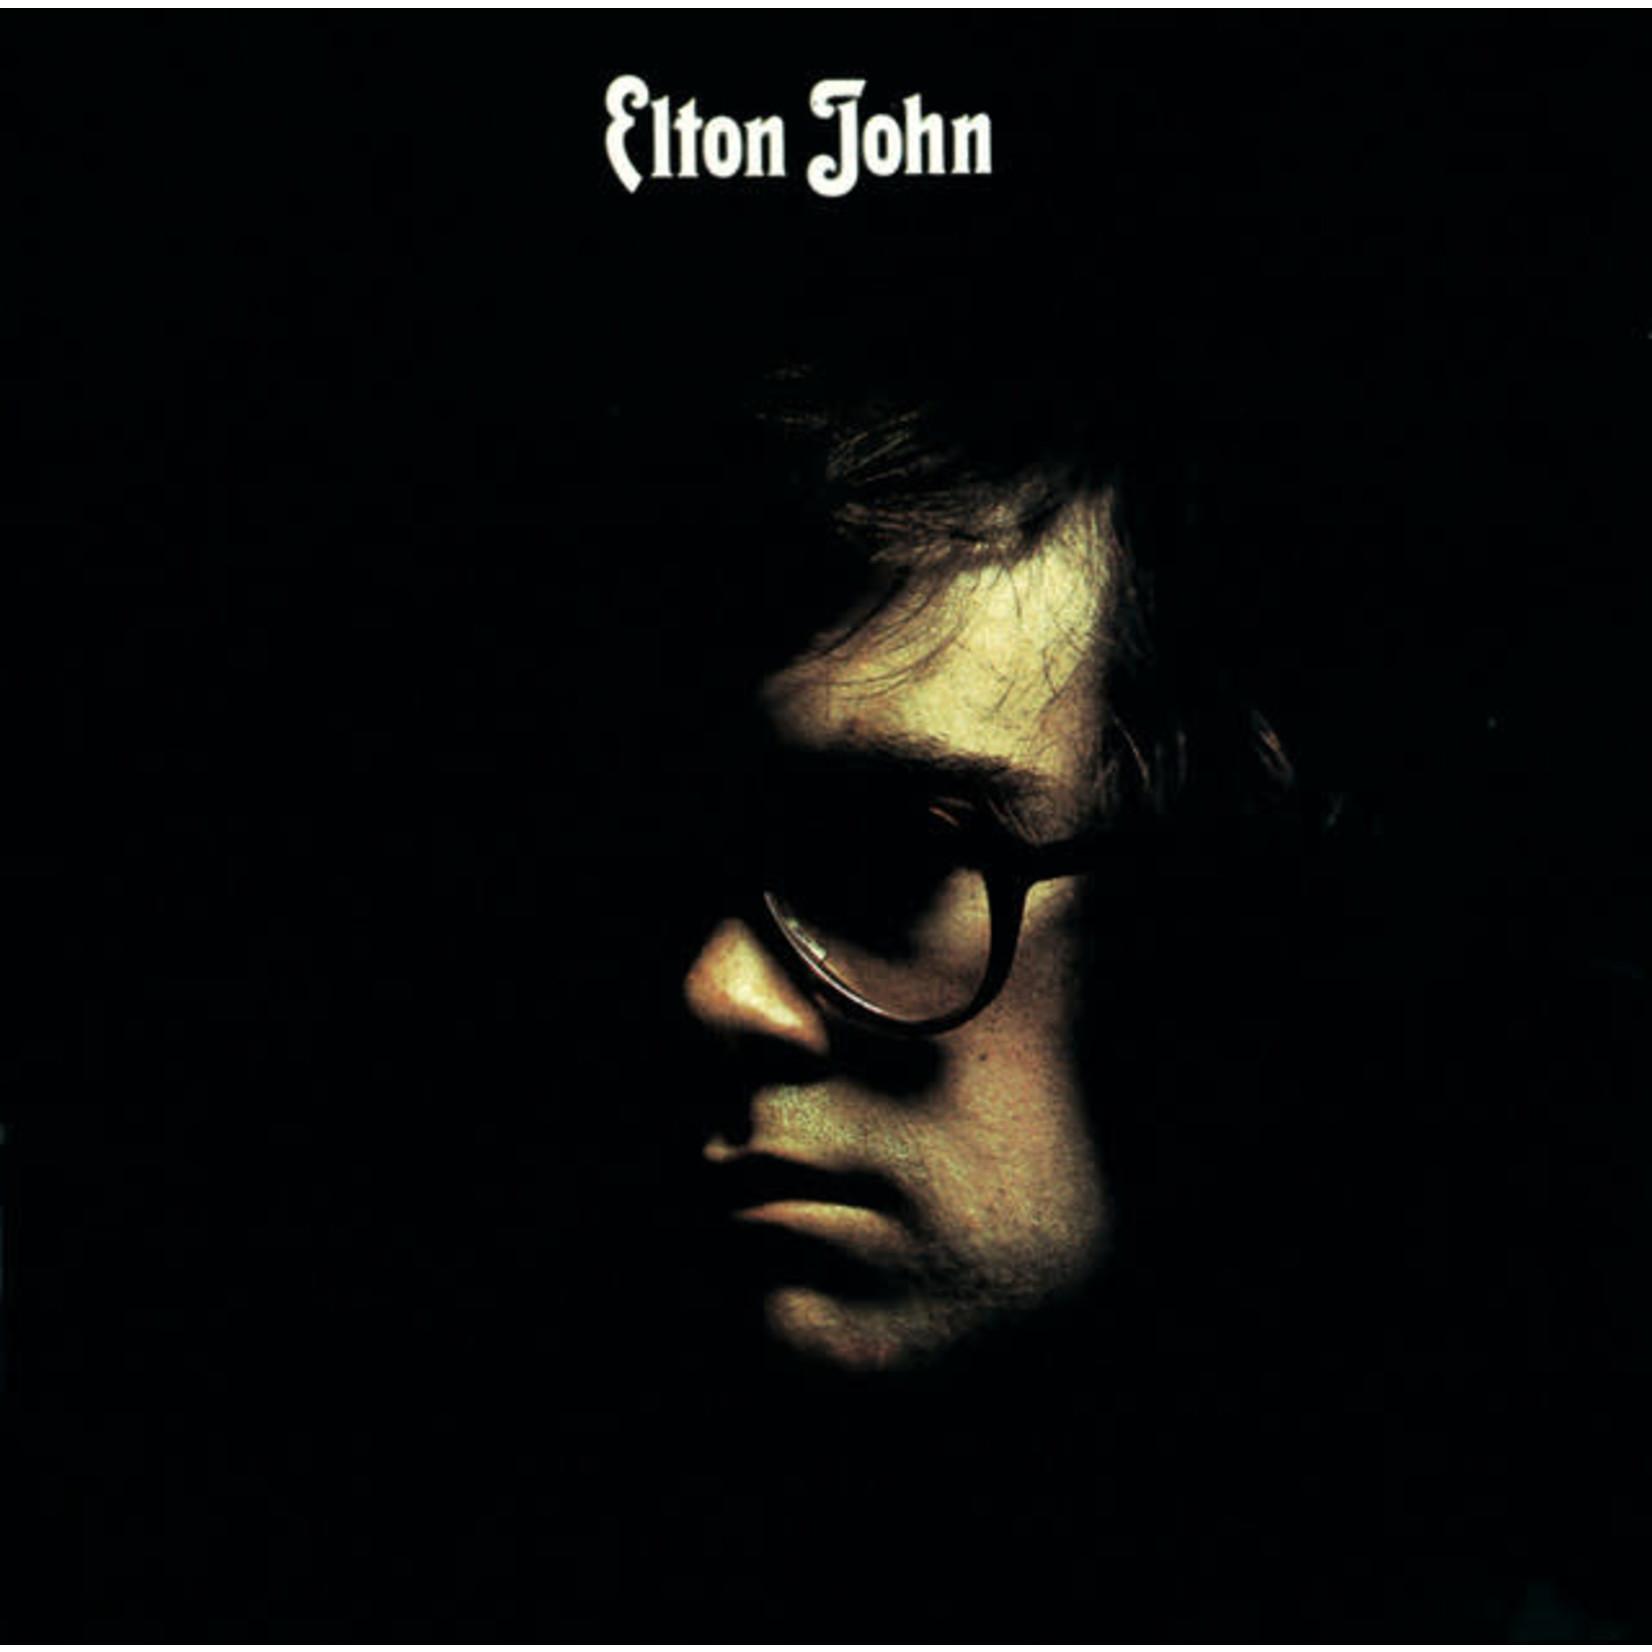 Vinyl Elton John - S/T